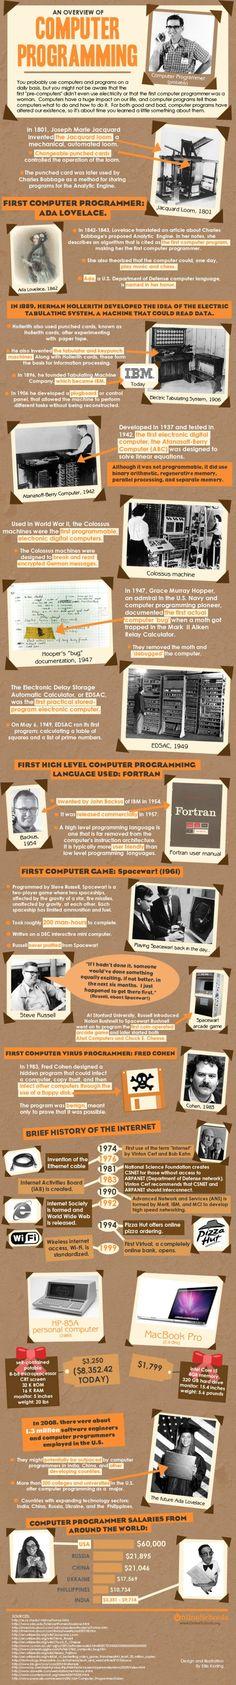 computer program history